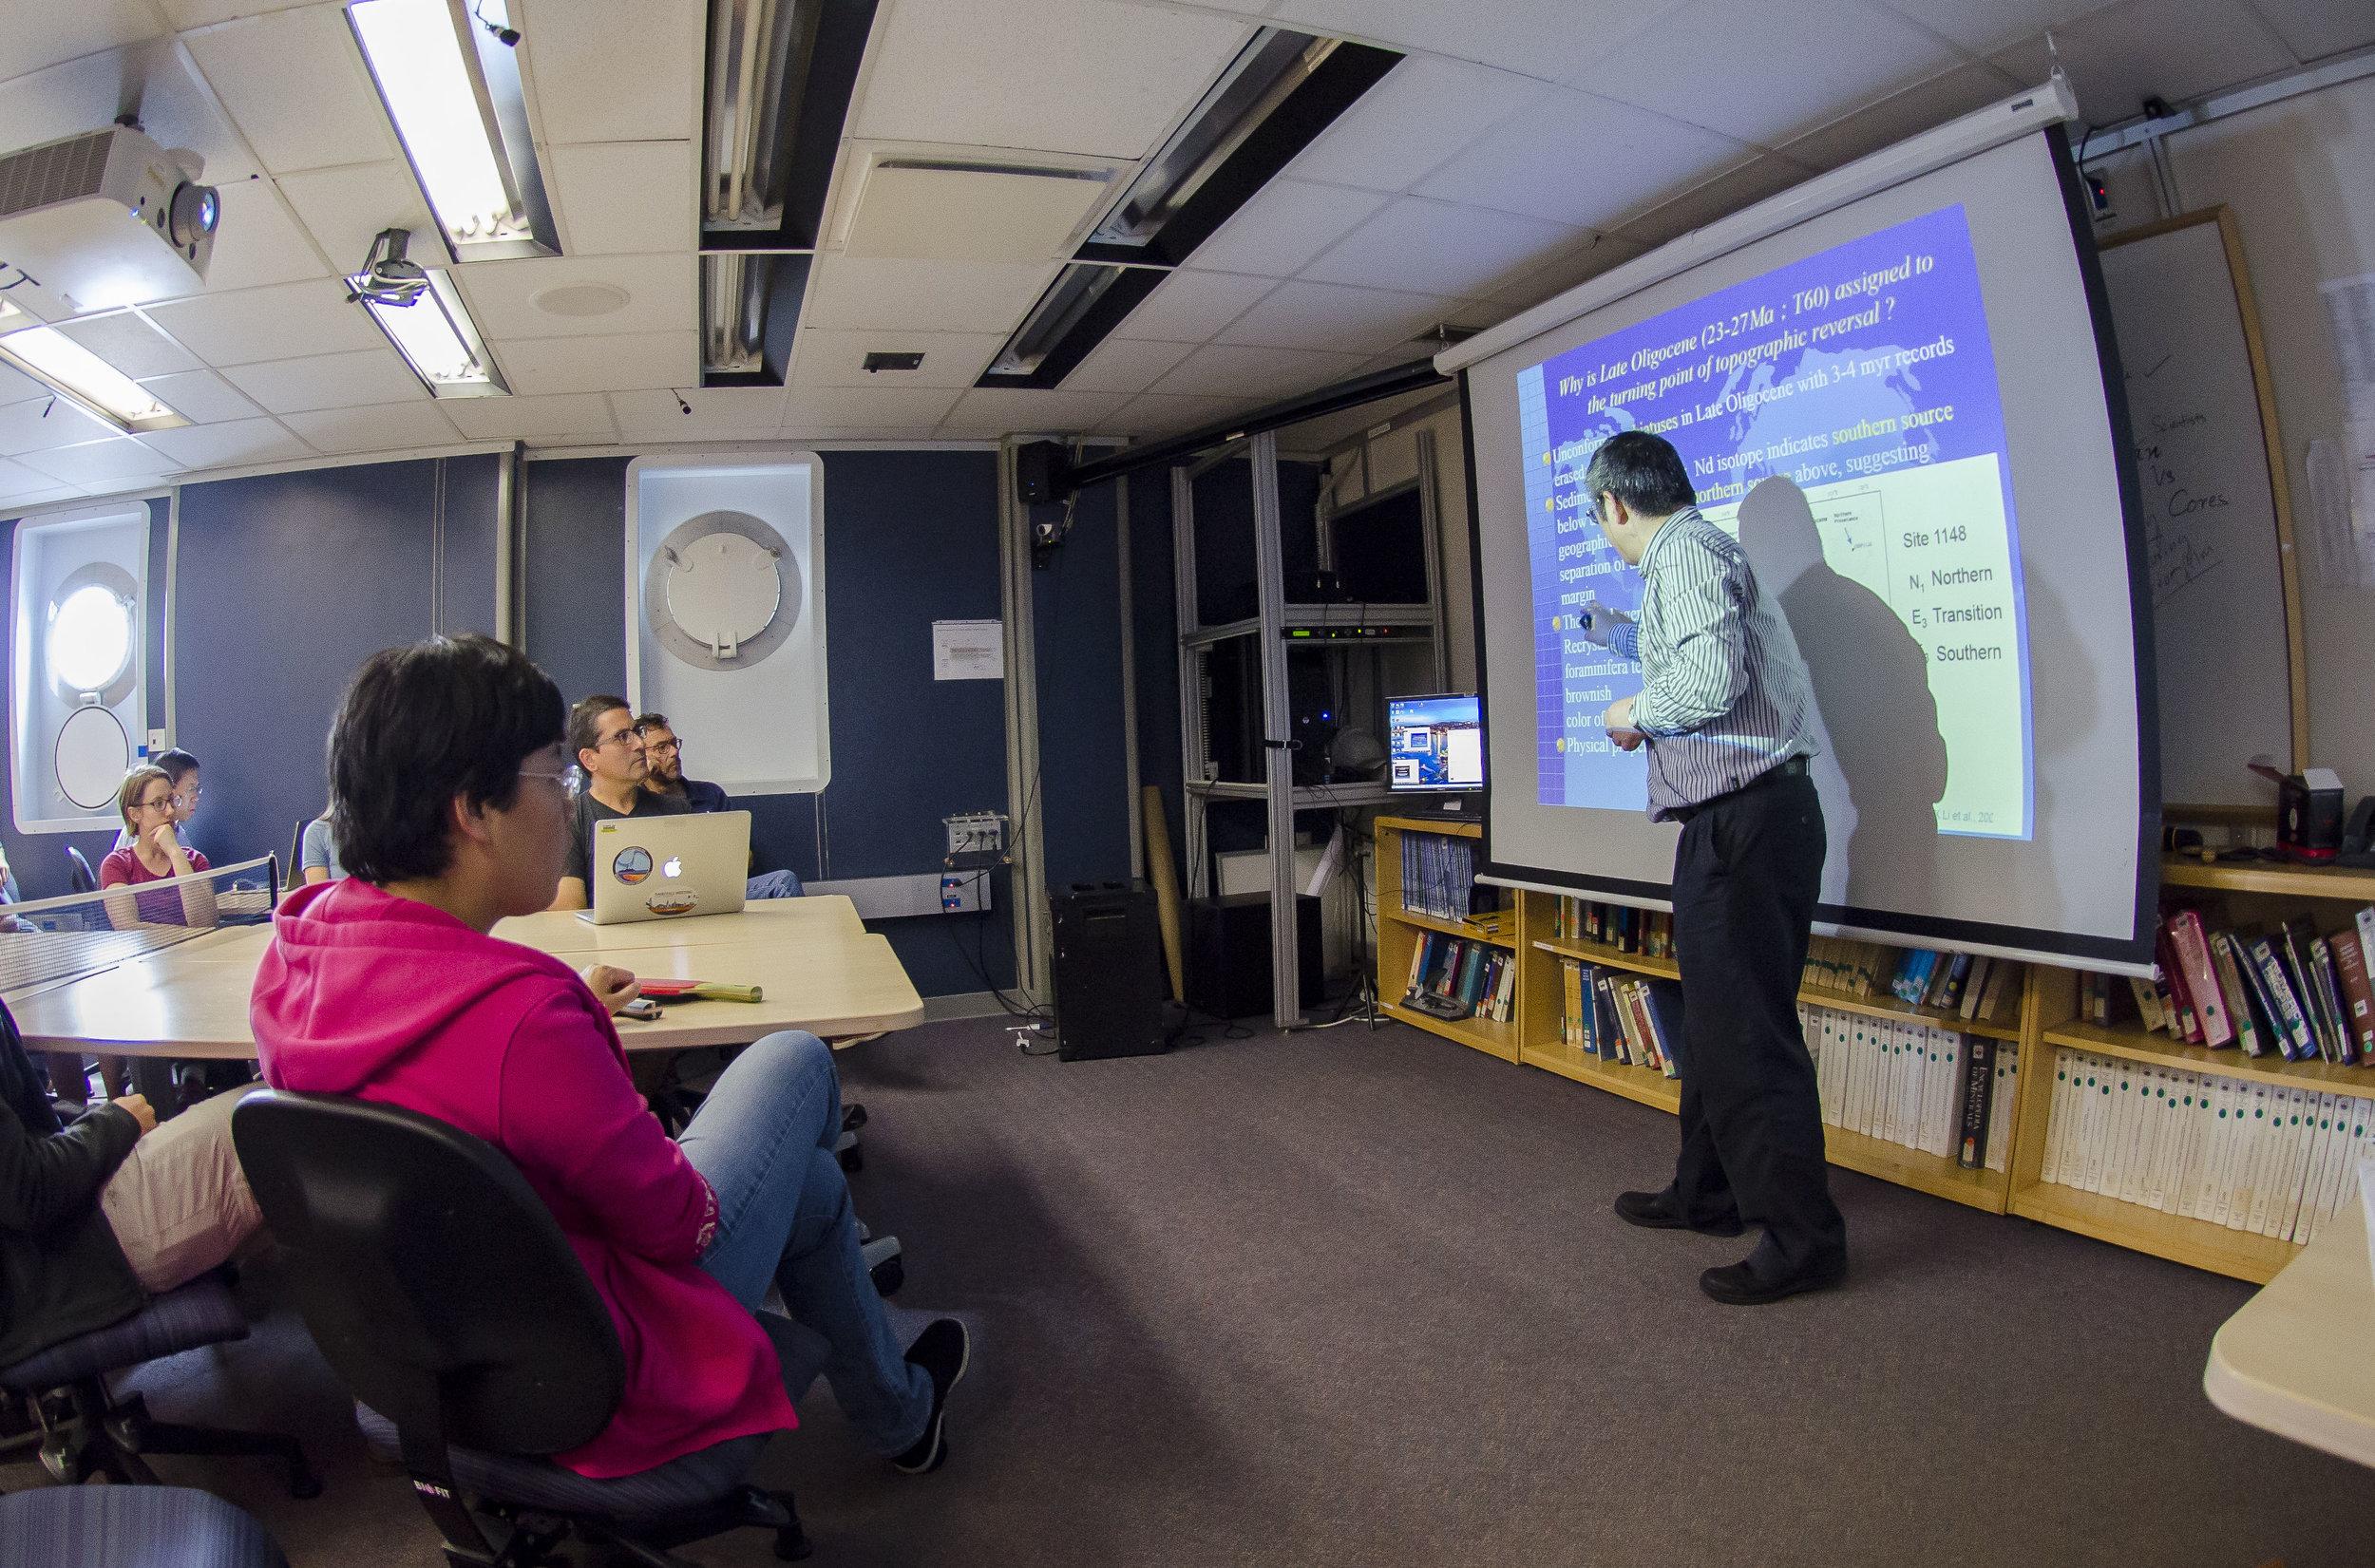 Crossover meeting presentation. Photo credit: Tim Fulton, IODP.